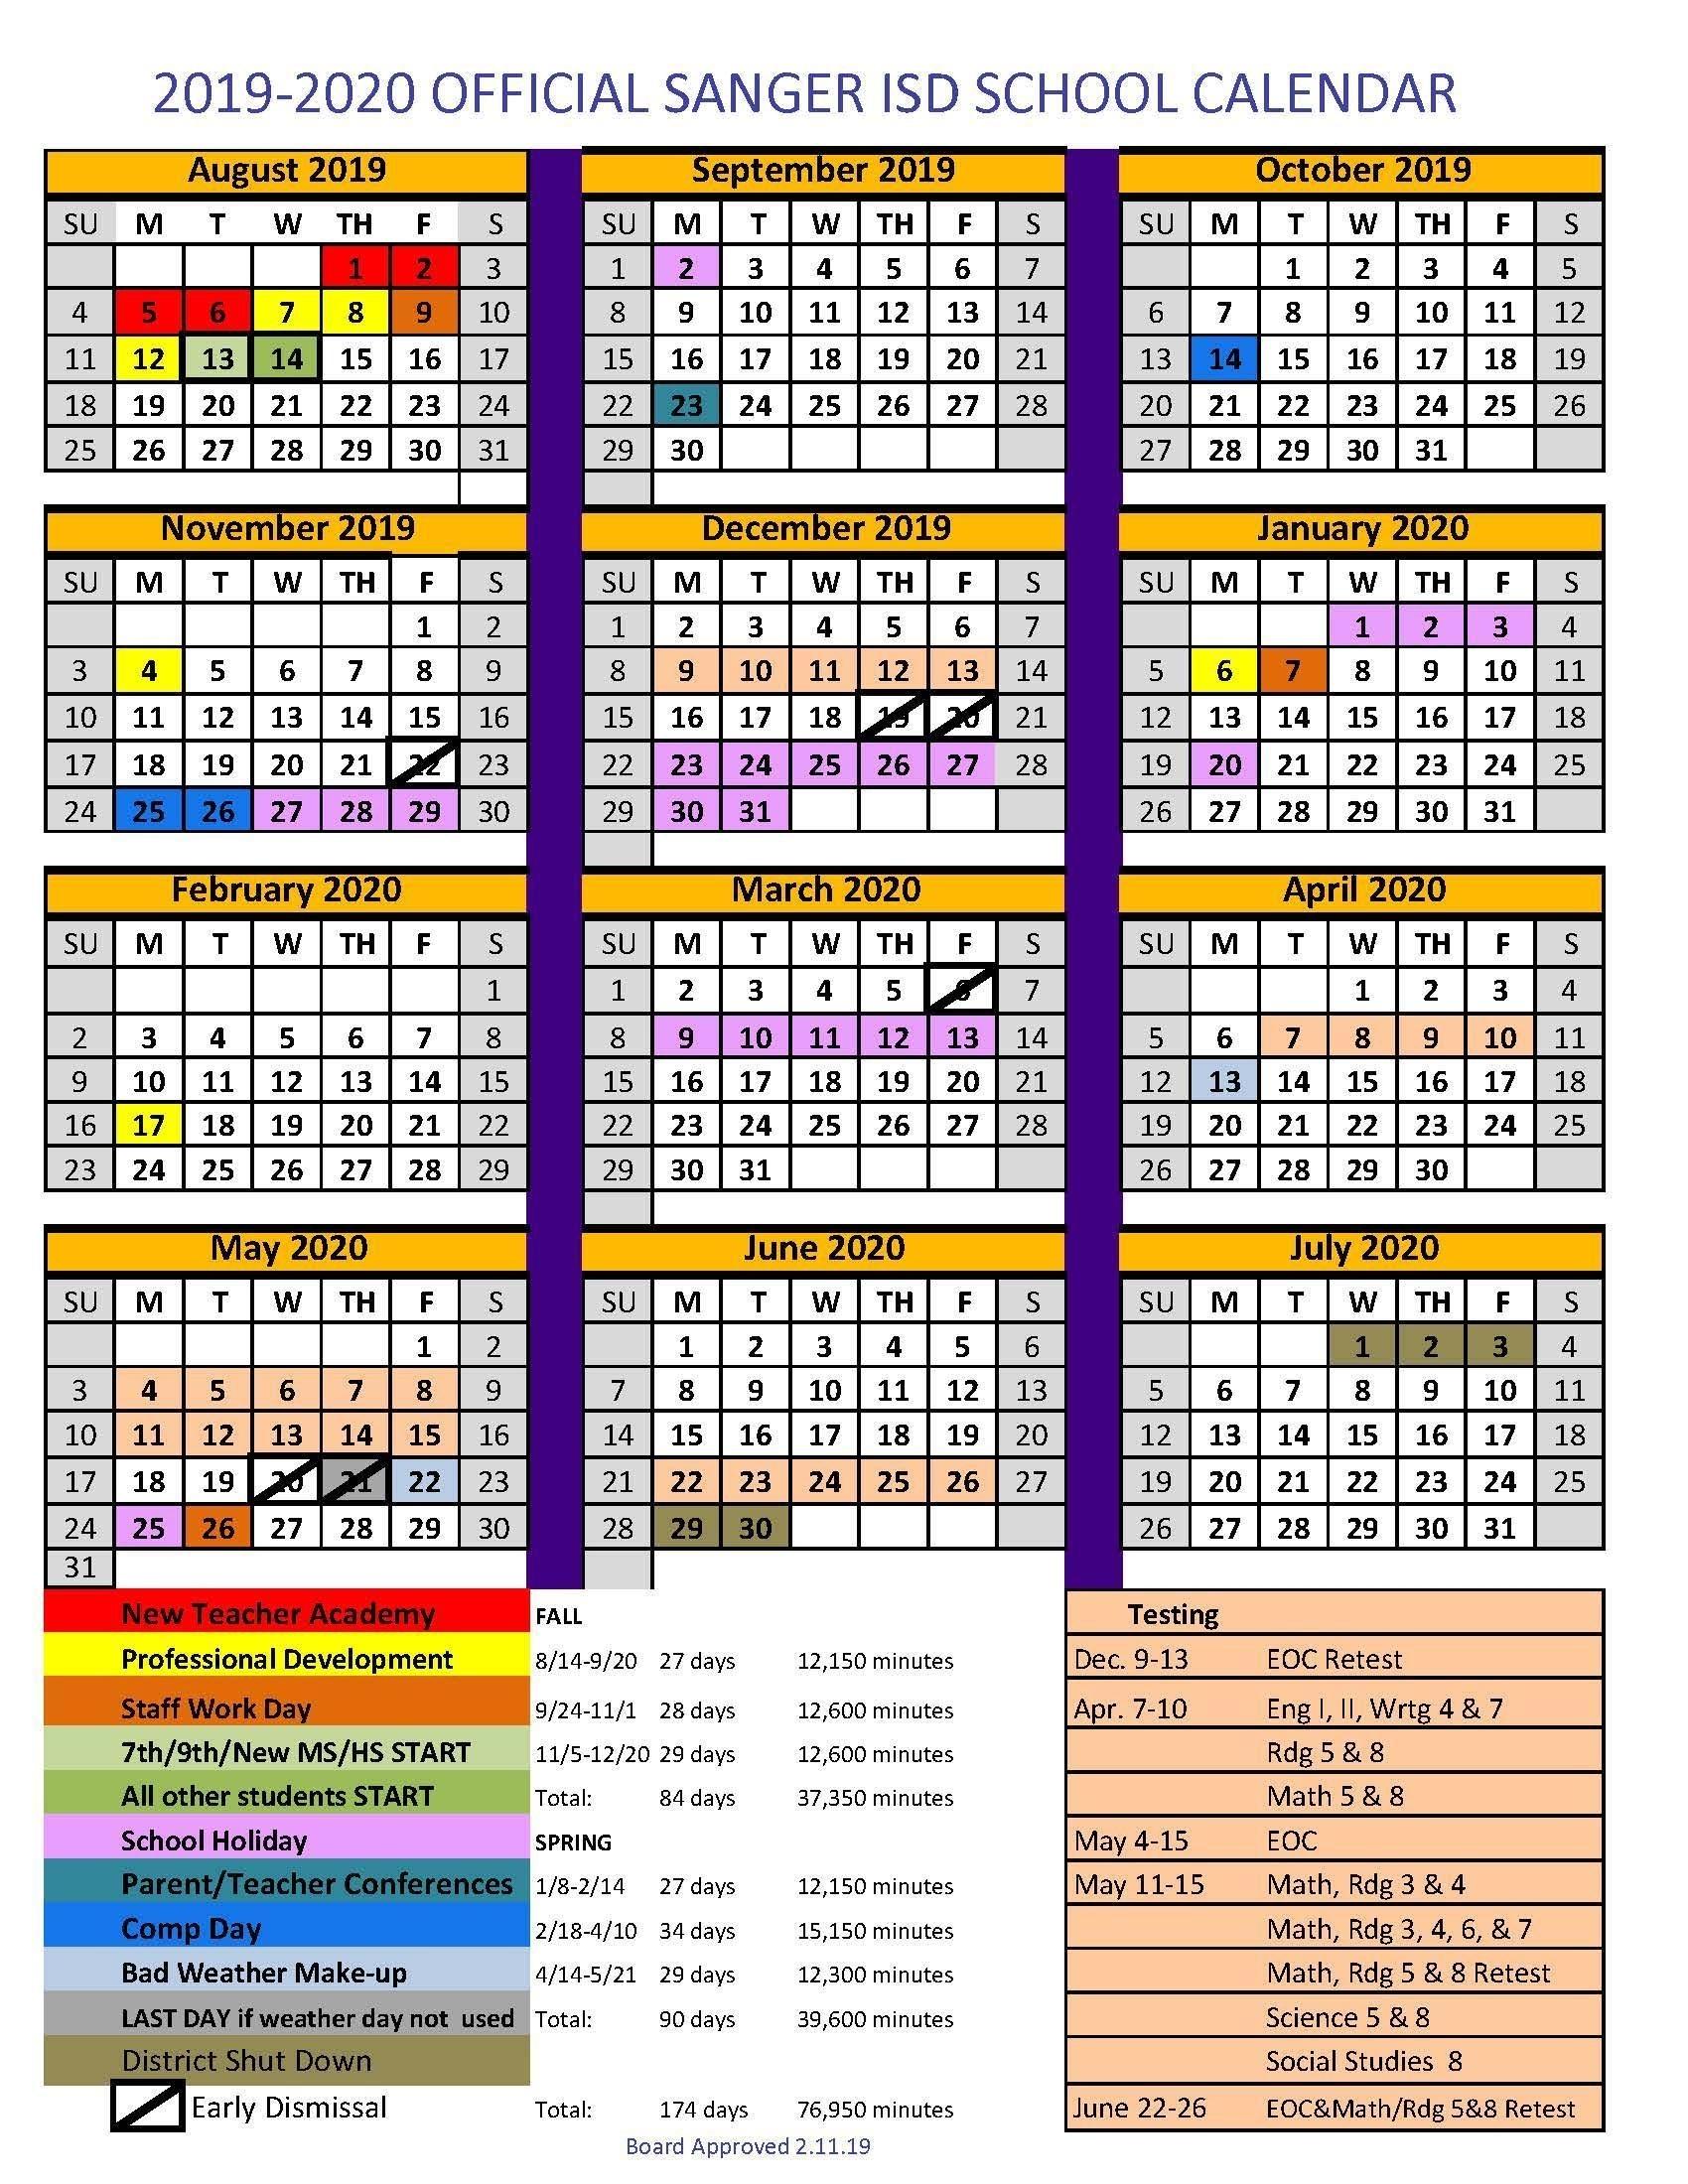 Sanger Independent School District-January 2020 School Calendar